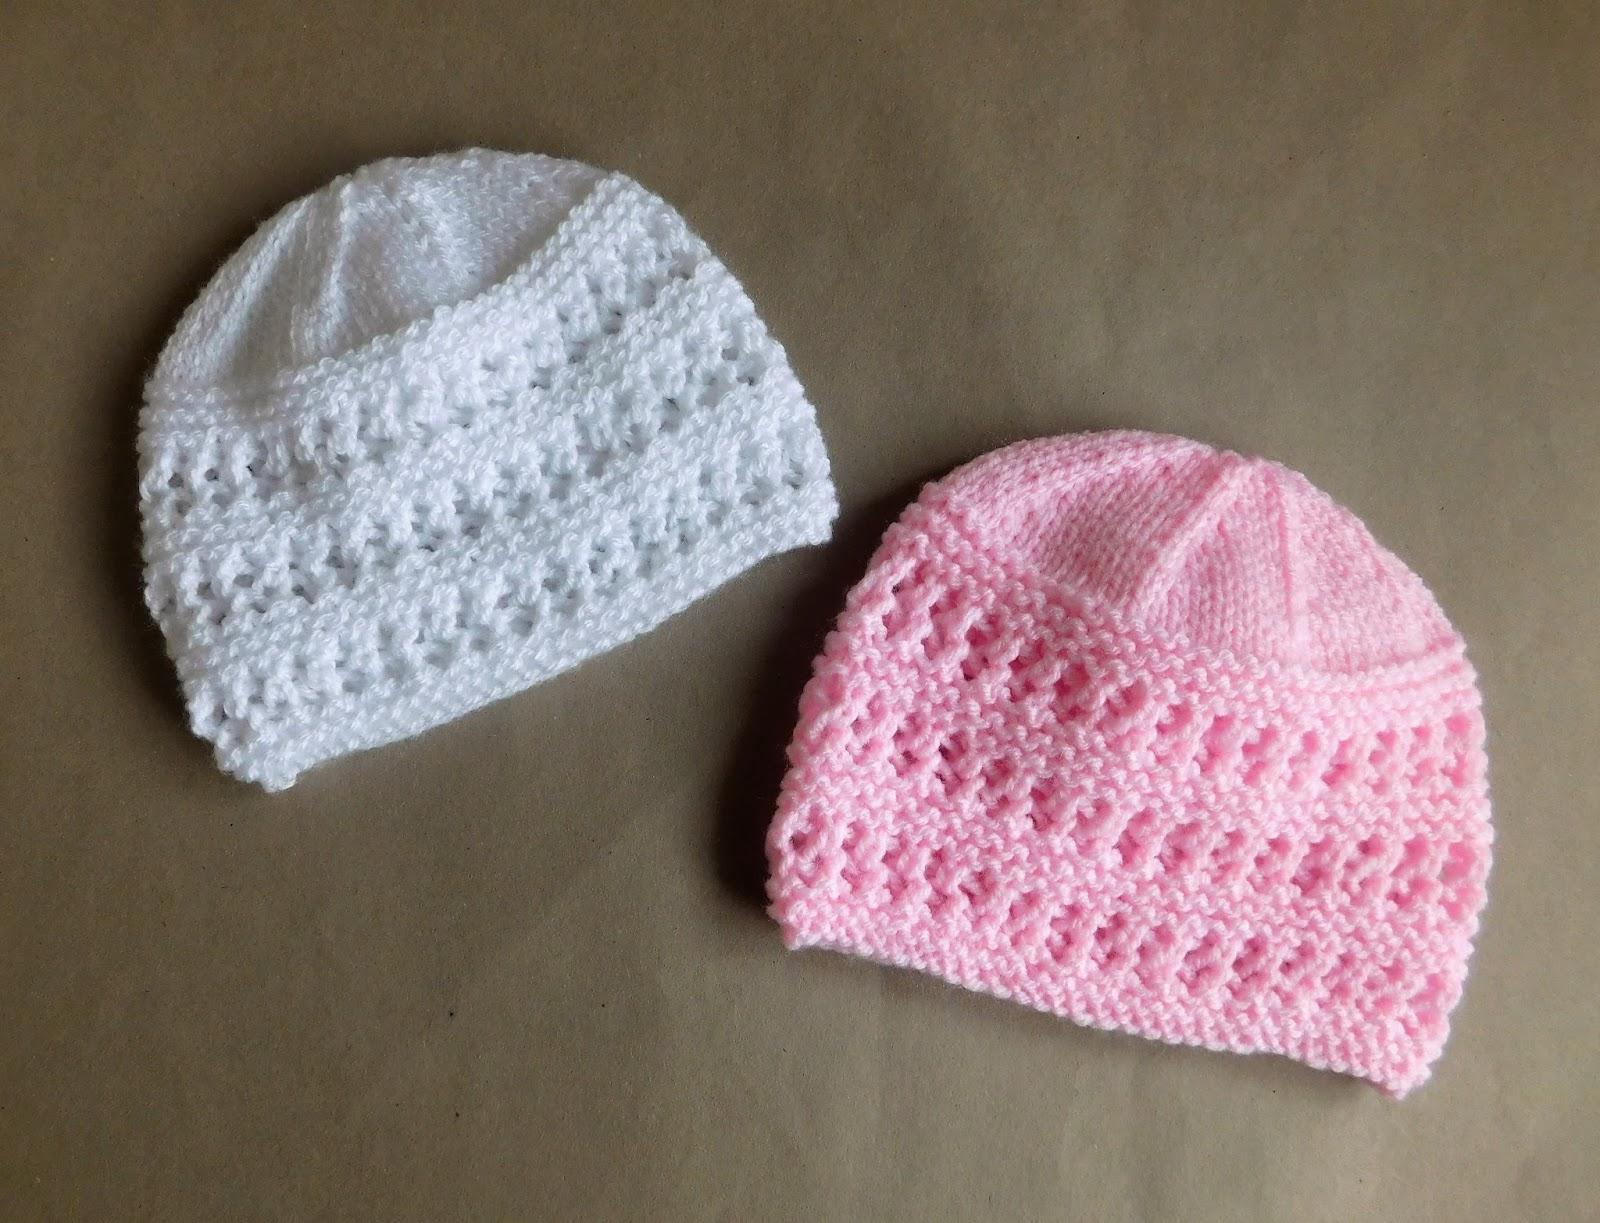 Easy Knitting Pattern For Babies : Marianna s lazy daisy days jasmine baby hat